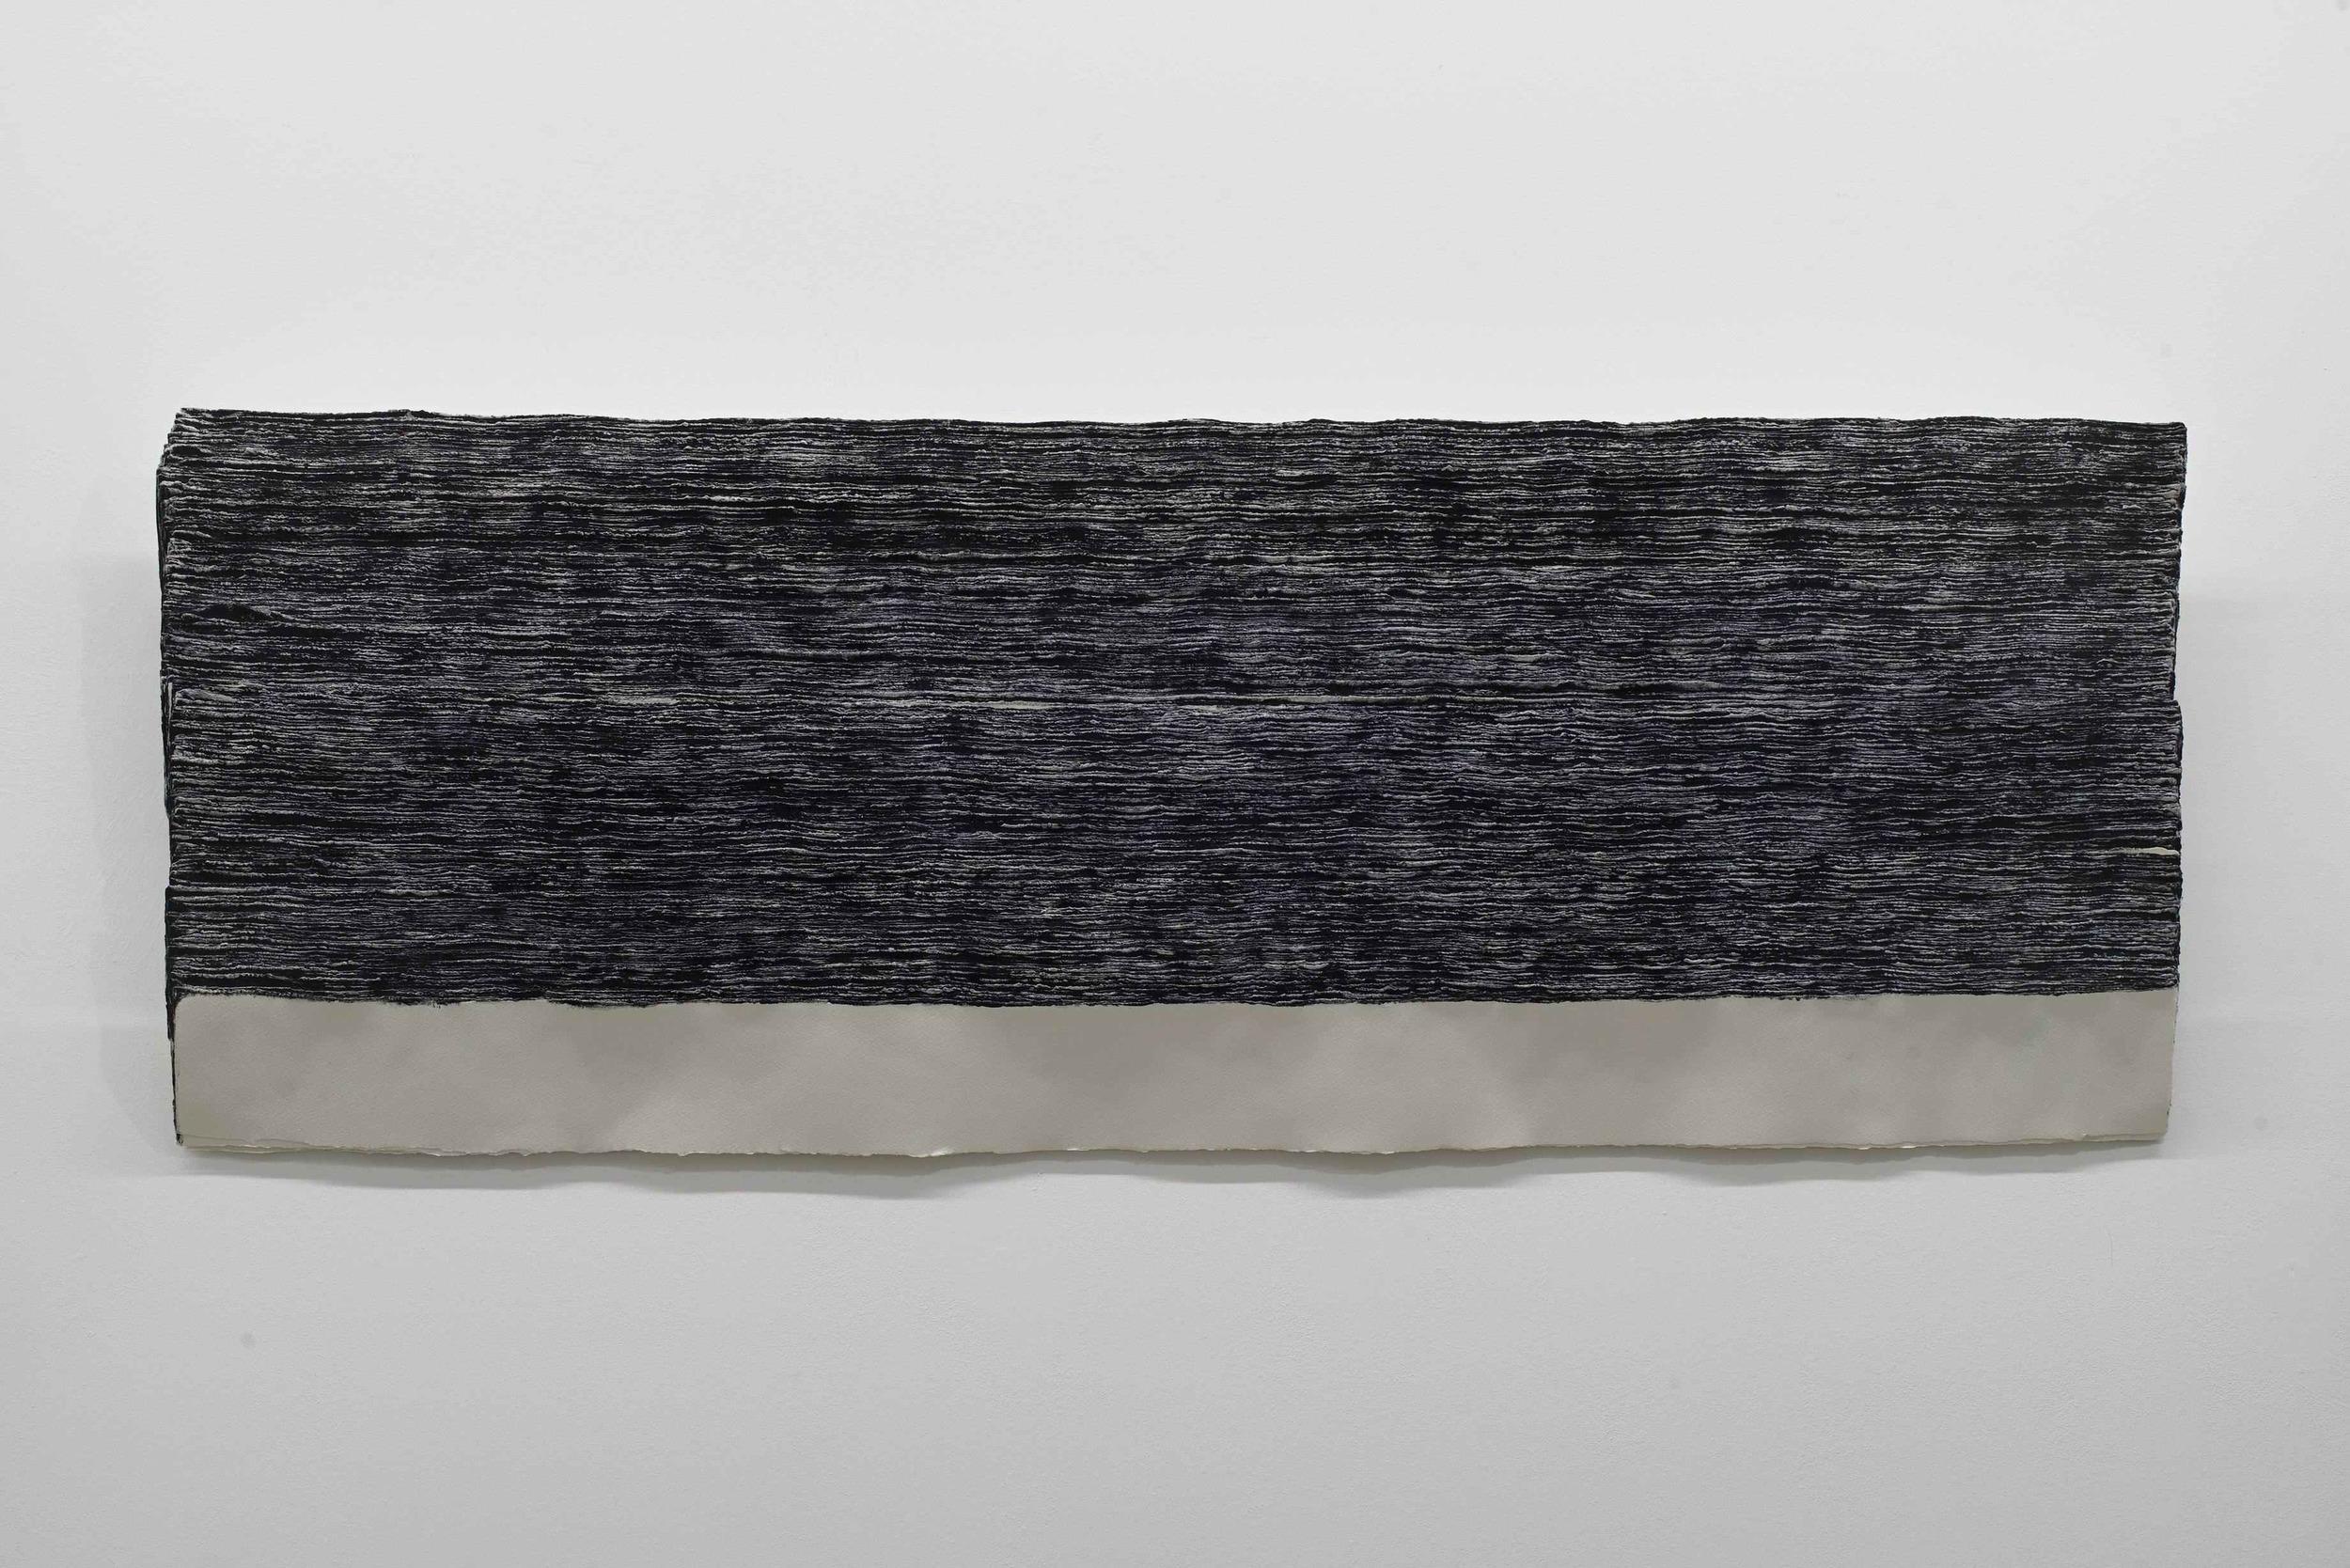 n. 329 - sedimentation (diptych) [Left] 2015 Acid-free cotton pulp watercolour paper, archival EVA glue, Aizumiiro (tourmaline mineral pigment), Ultramarine ash pigment and nikawa (cow glue hide) H58 x D150 x W6 cm (each; artwork)